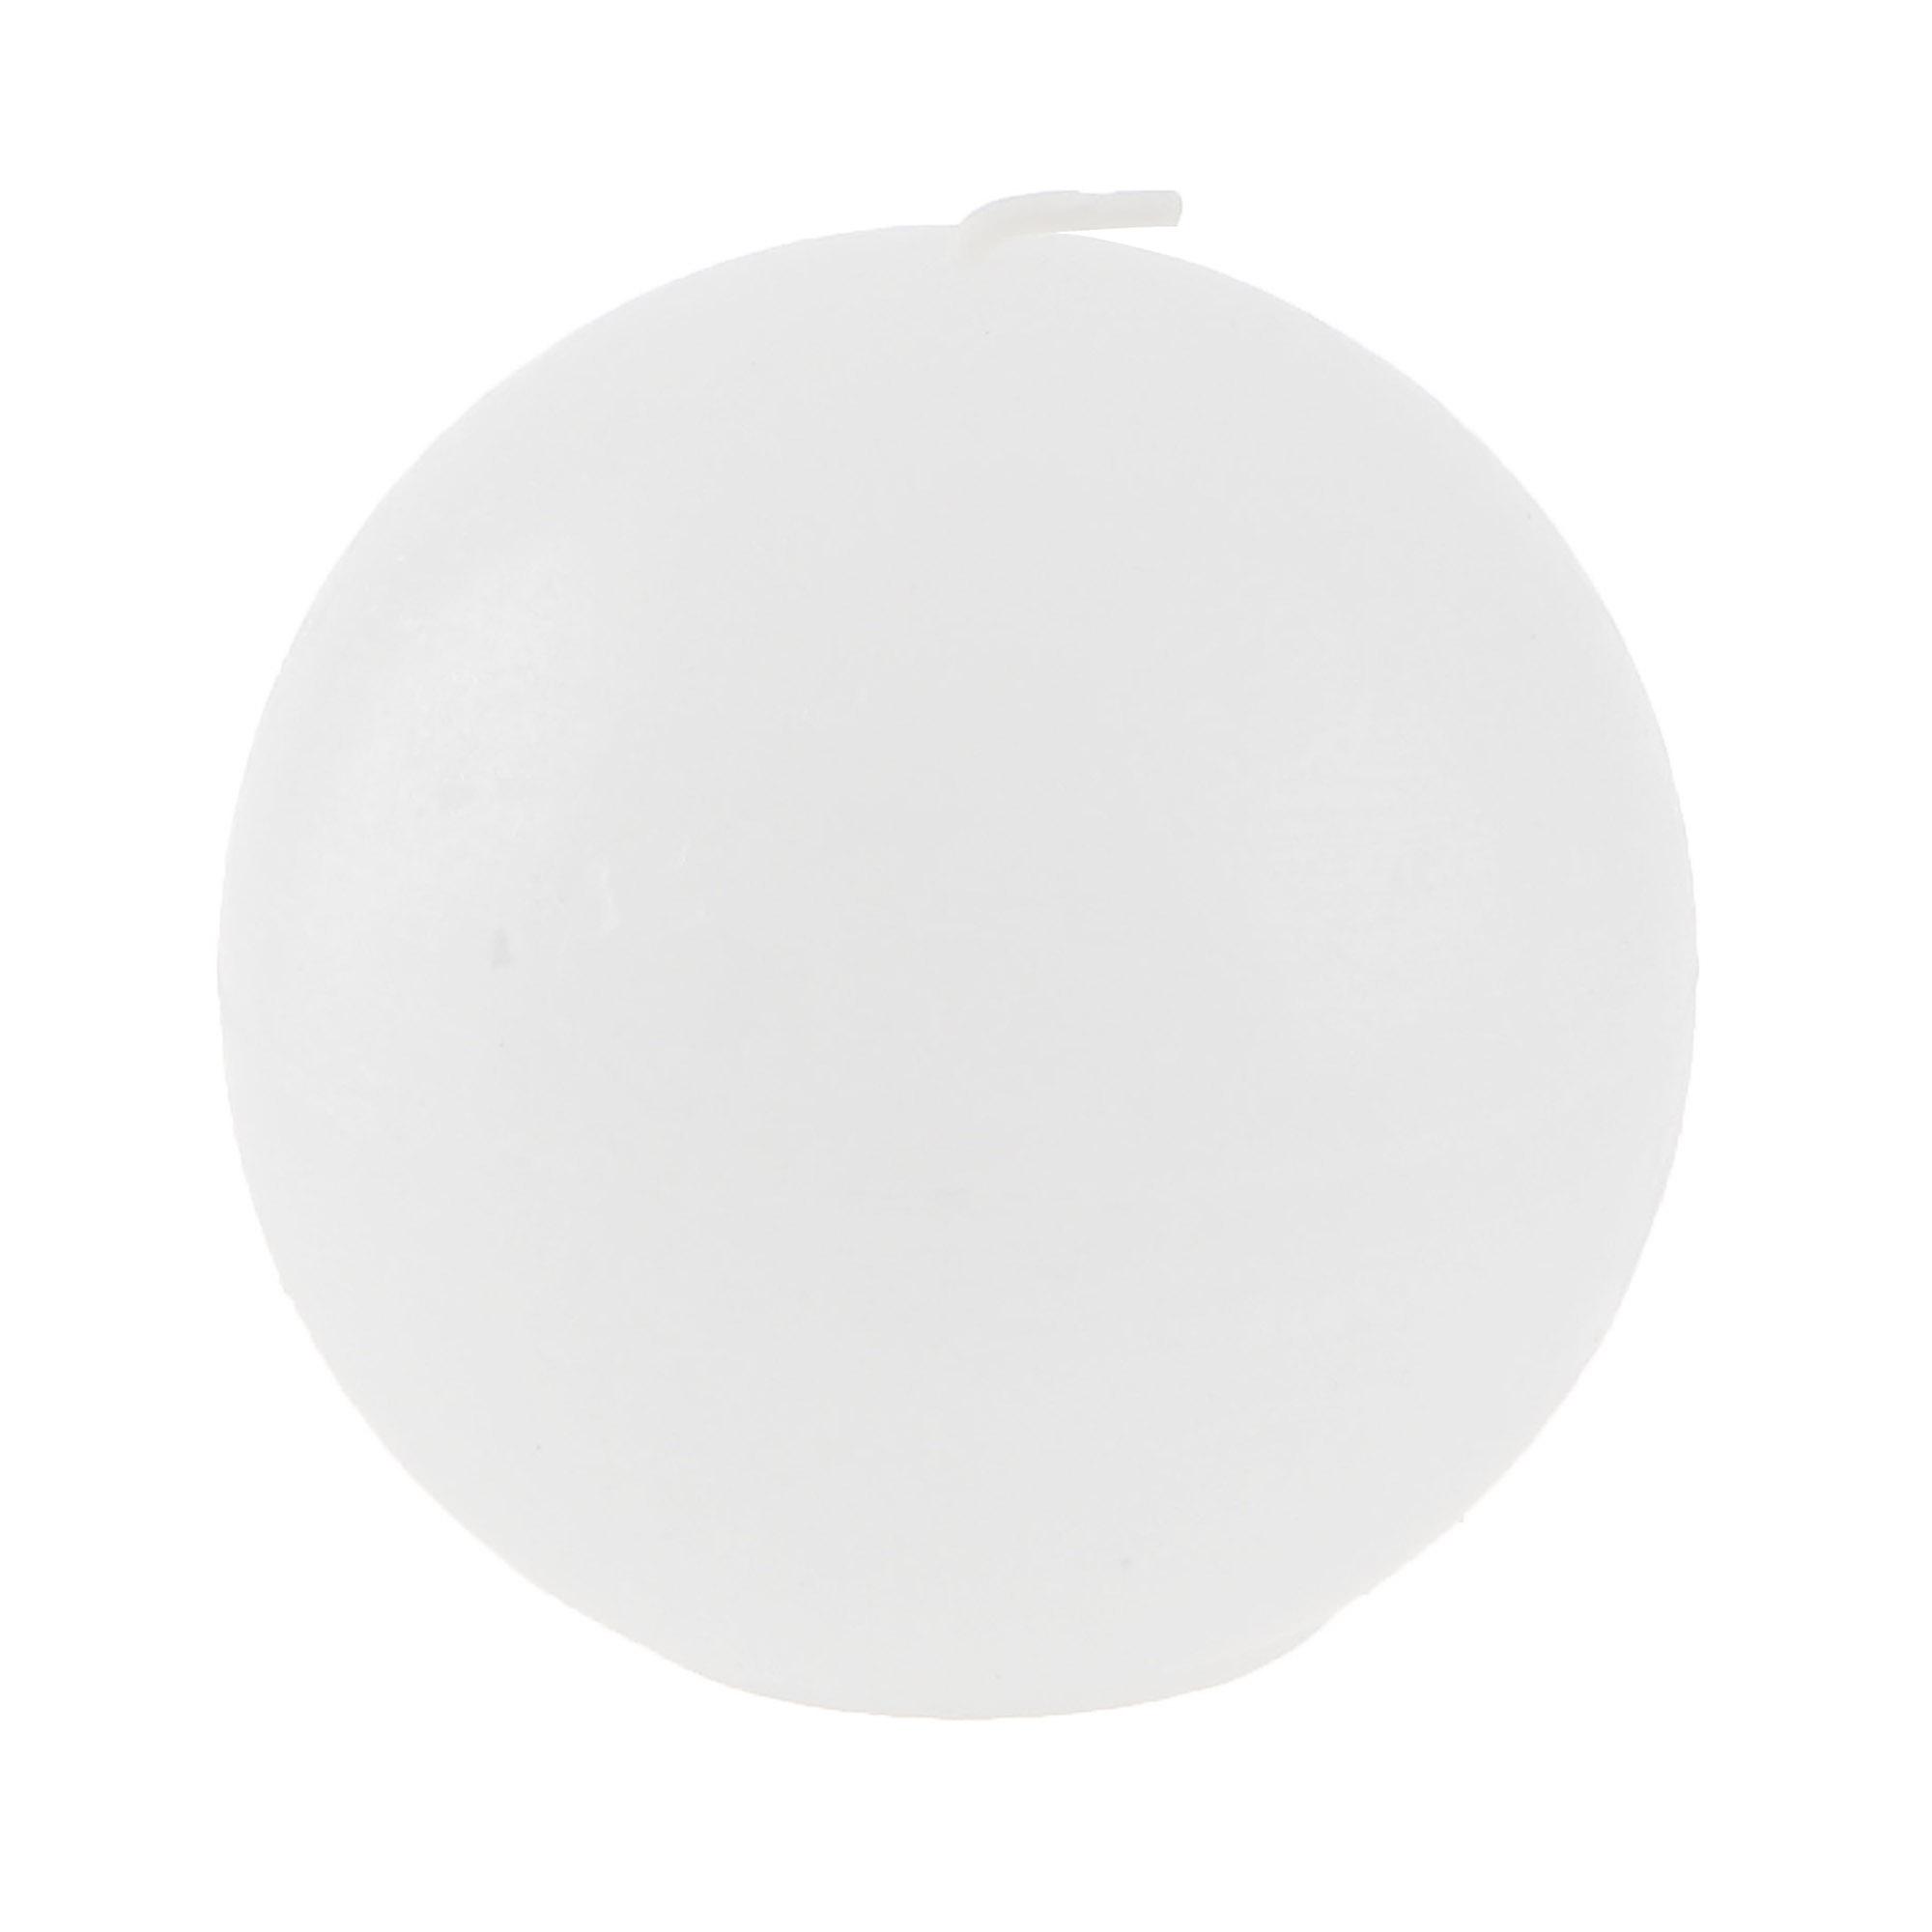 Свеча круглая Bolsius rustic 80мм белая